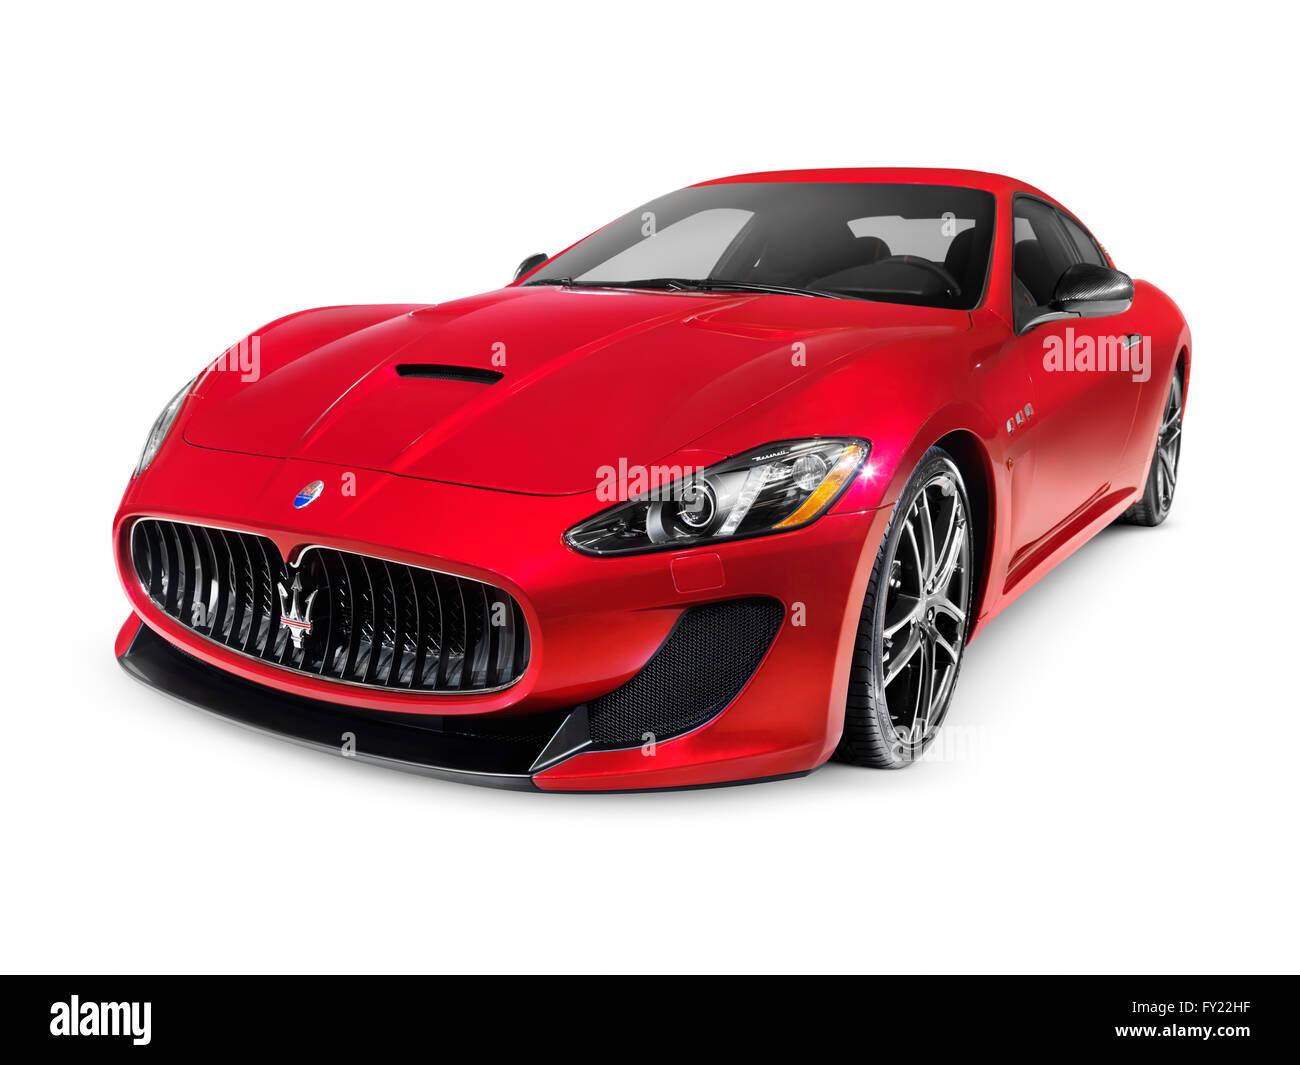 2015 Red Maserati GranTurismo MC Centennial Edition luxury car - Stock Image